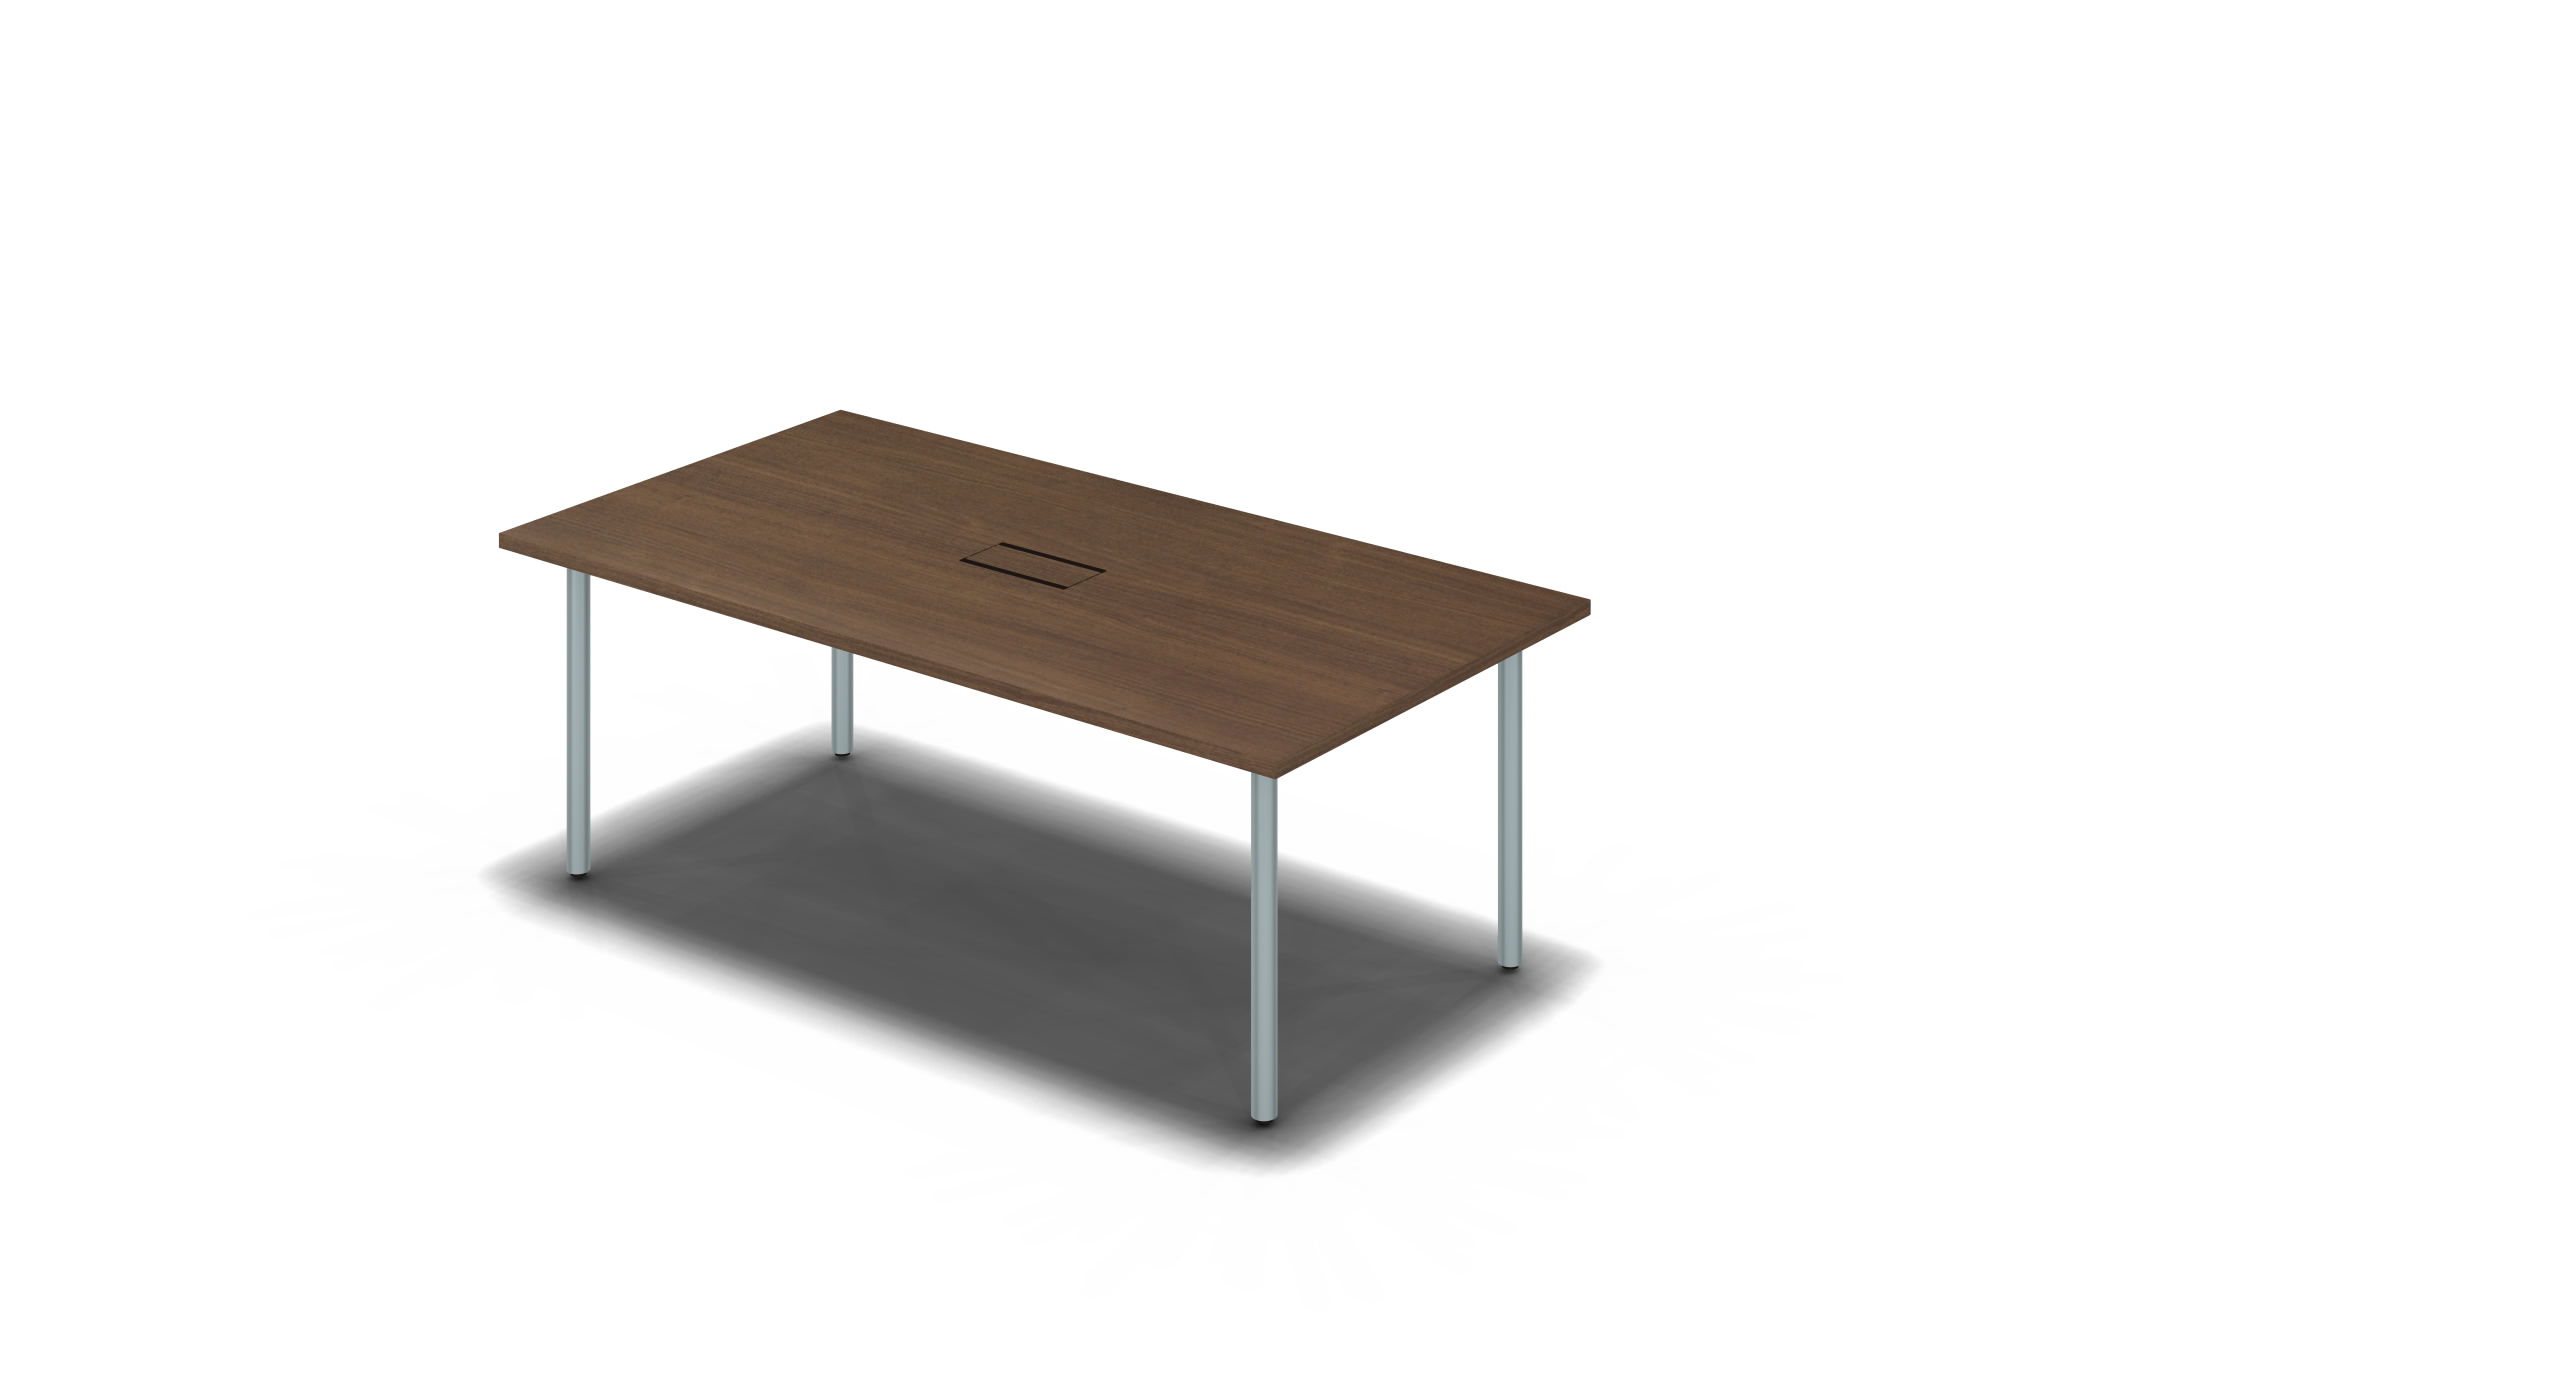 Table_Round_1800x900_Silver_Walnut_withOption